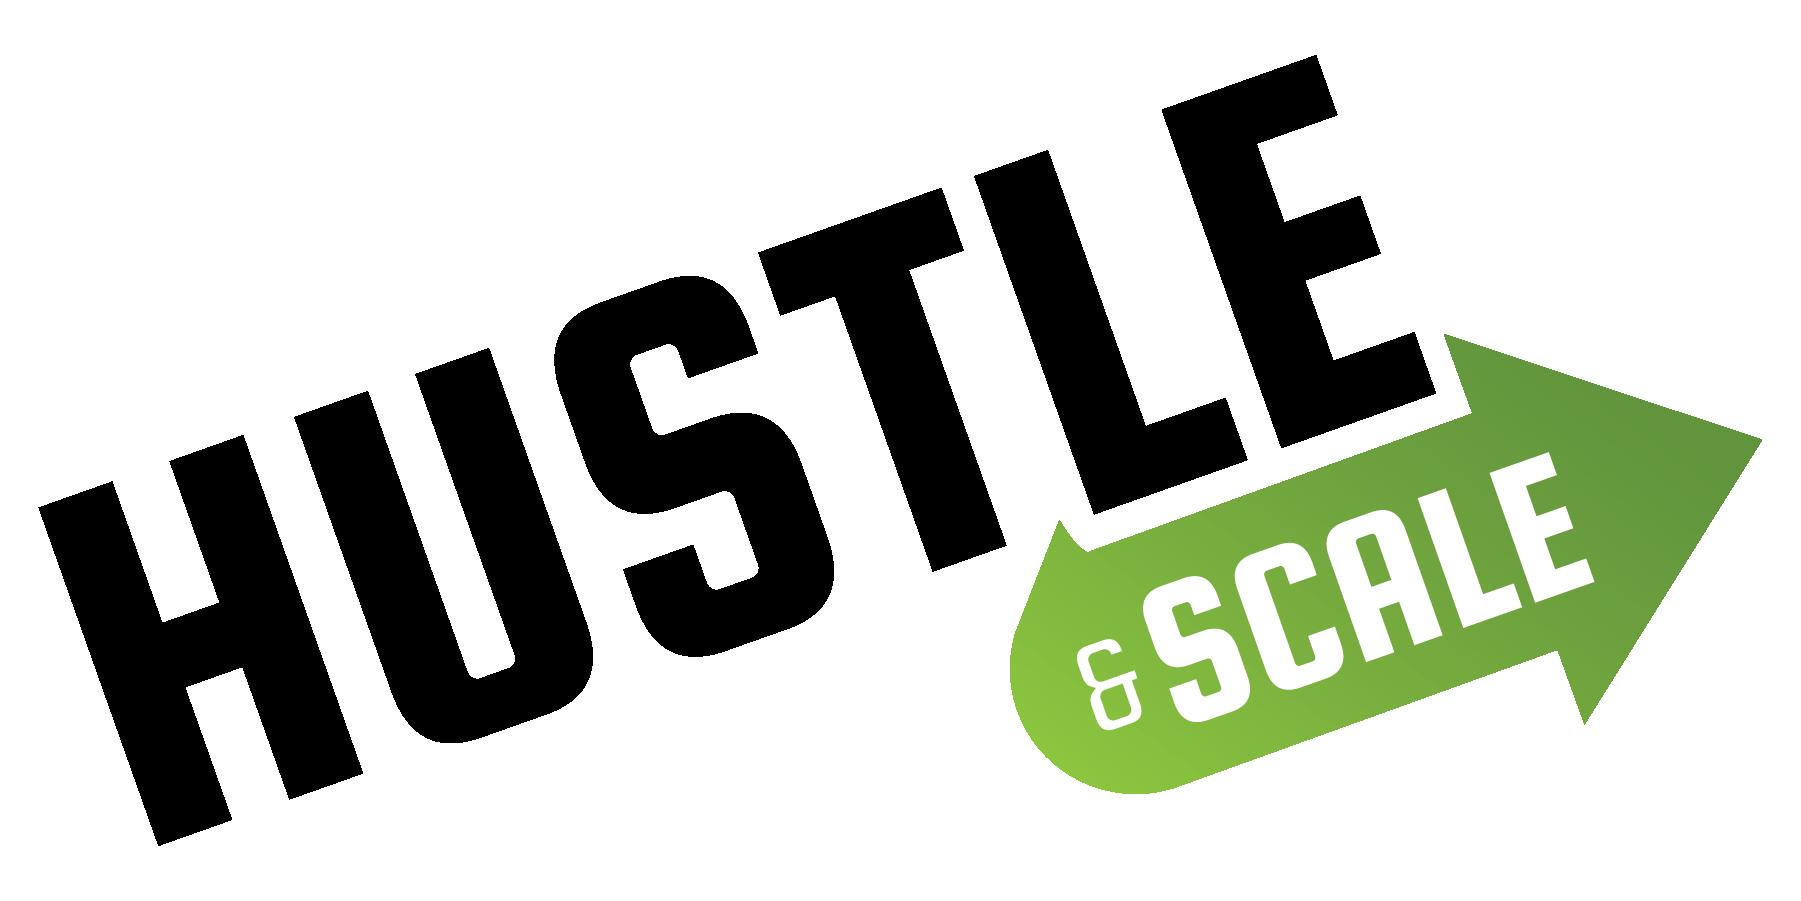 hustle-scale-logo-01 (1)